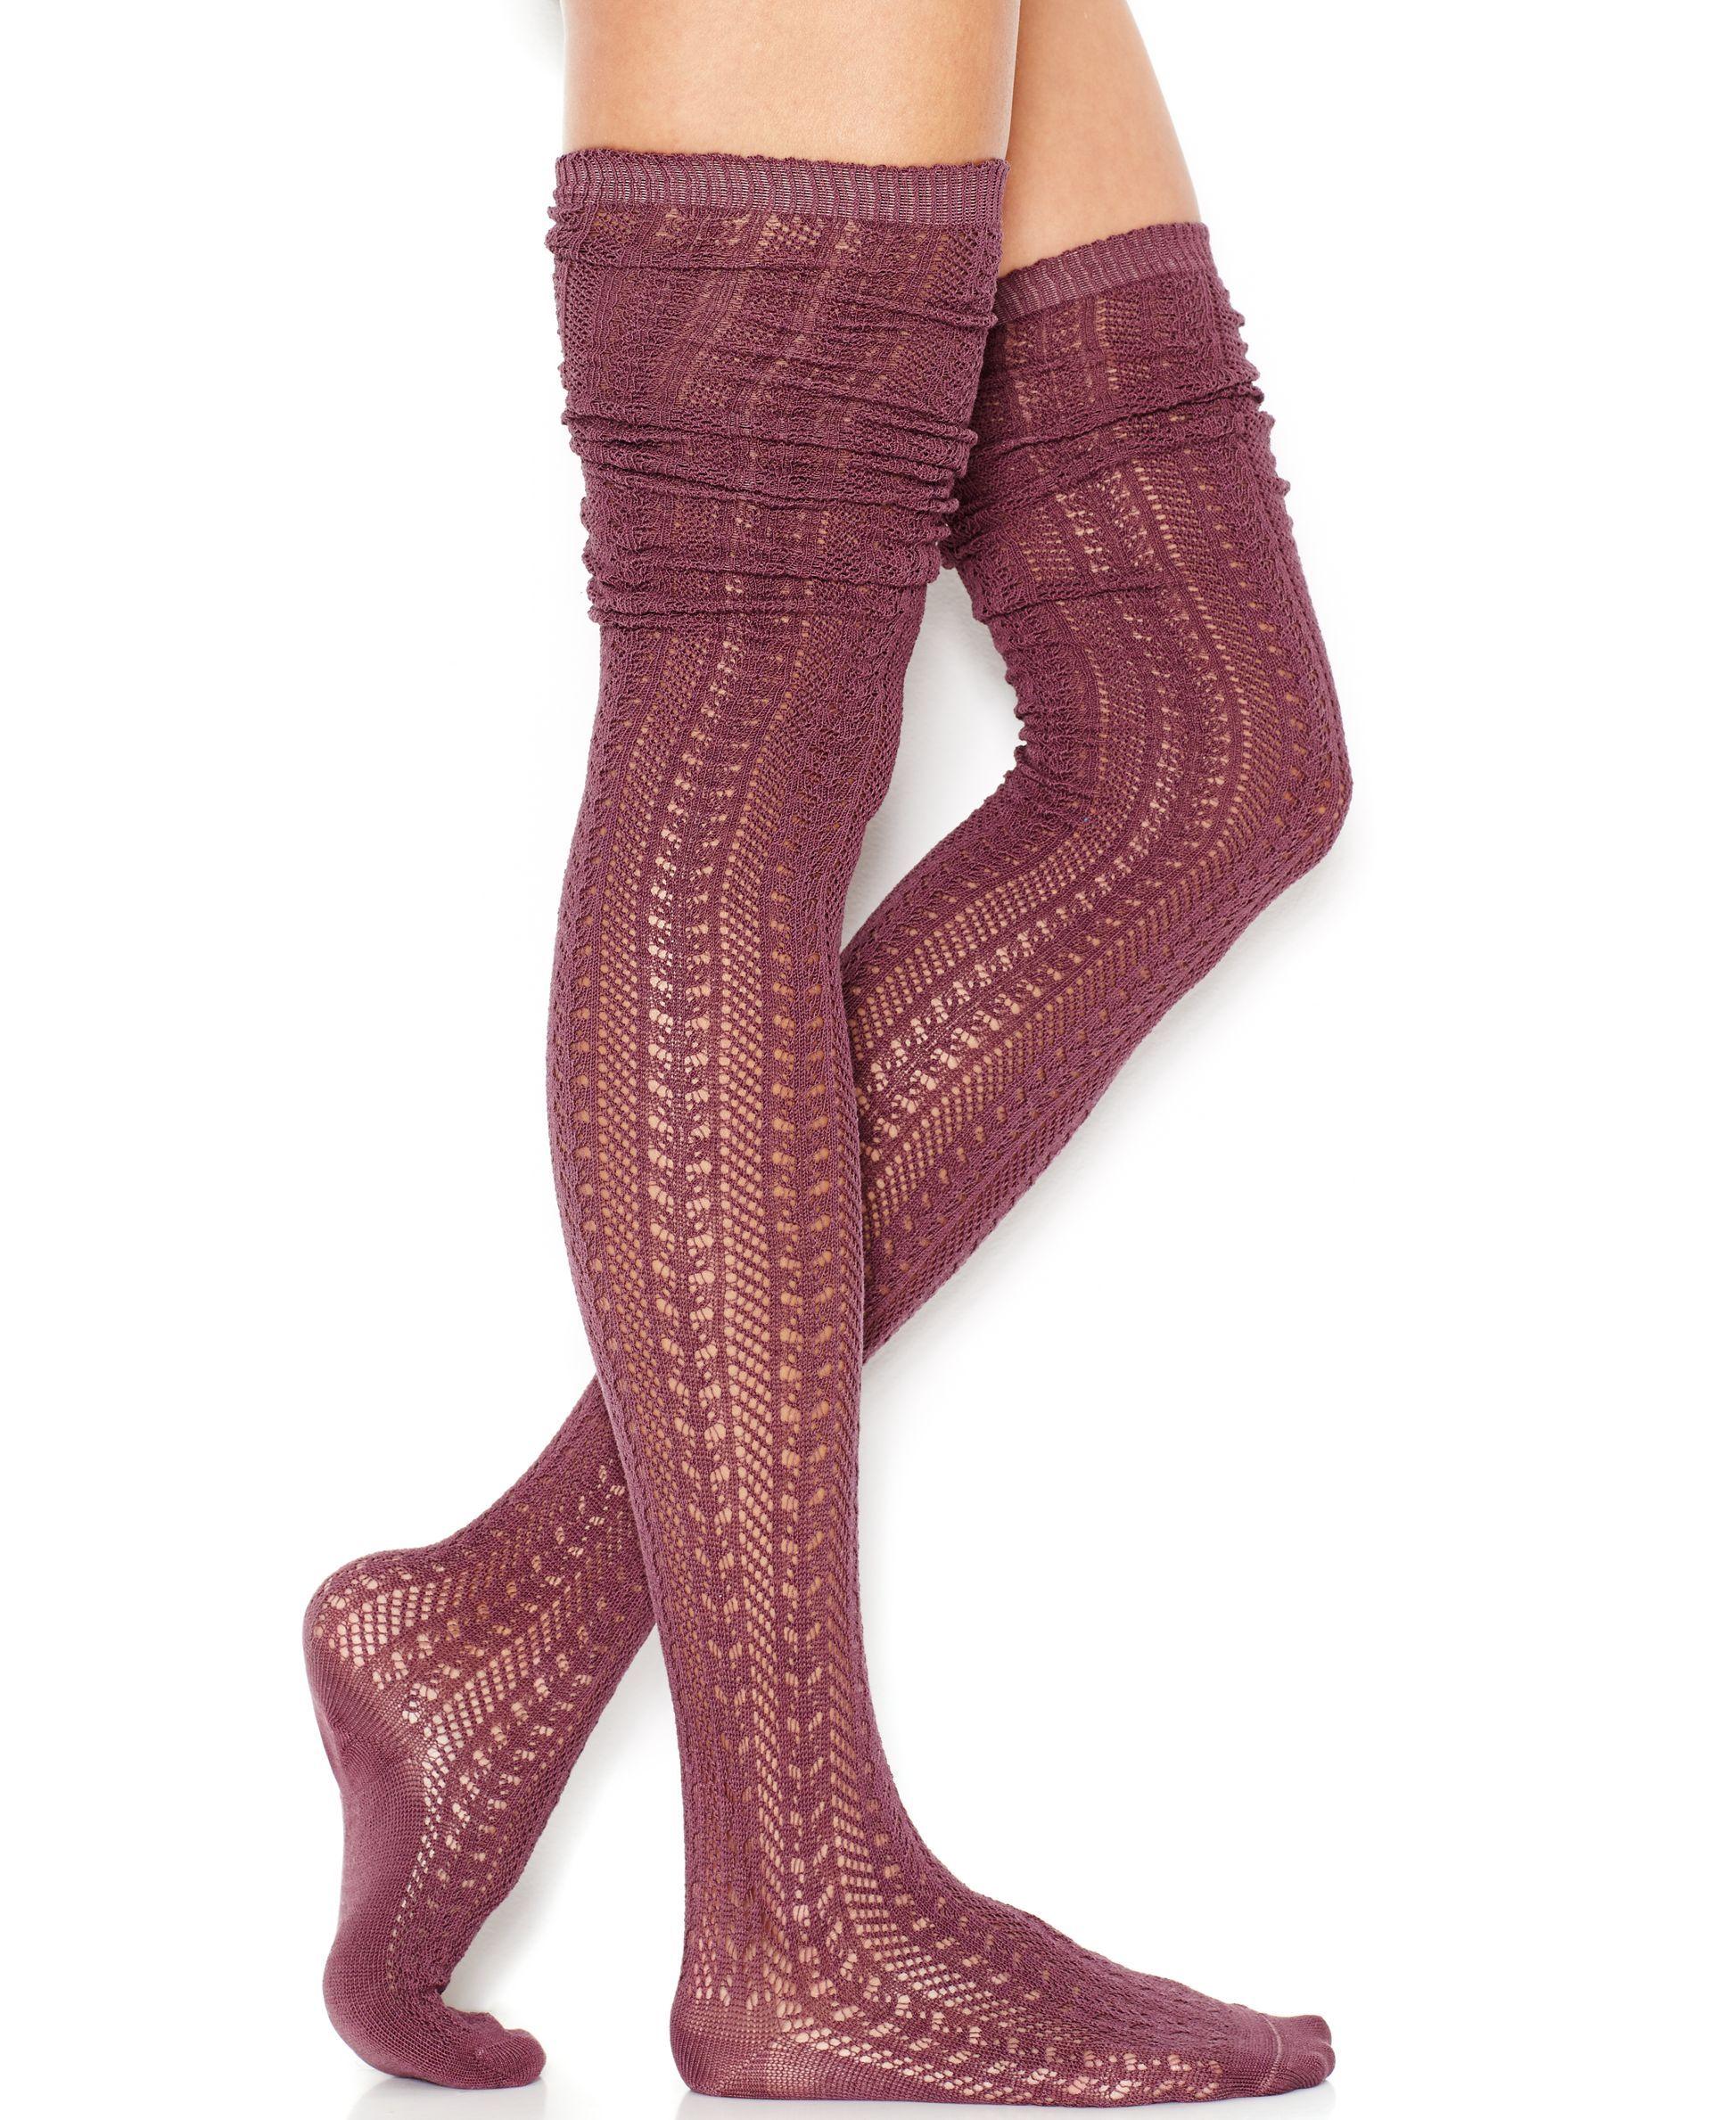 3b78047f5e0 Free People Hammock Thigh-High Knit Socks - Free People - Women - Macy s